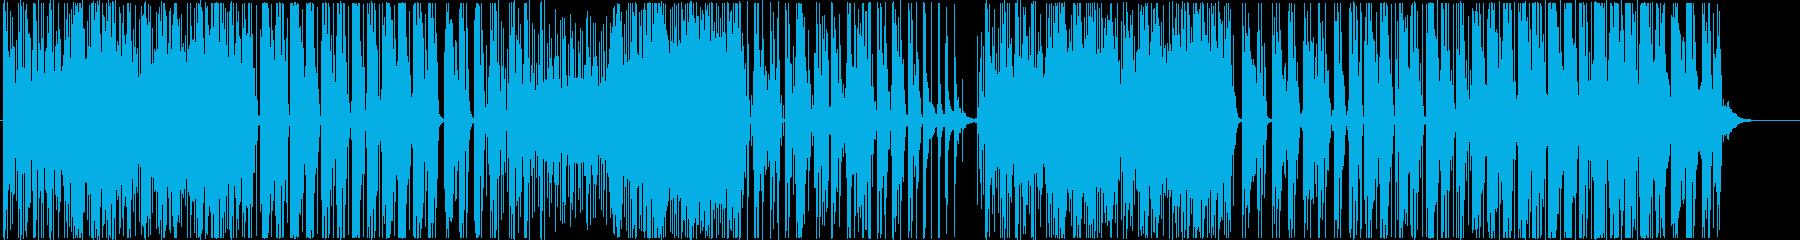 Muzhhikの再生済みの波形